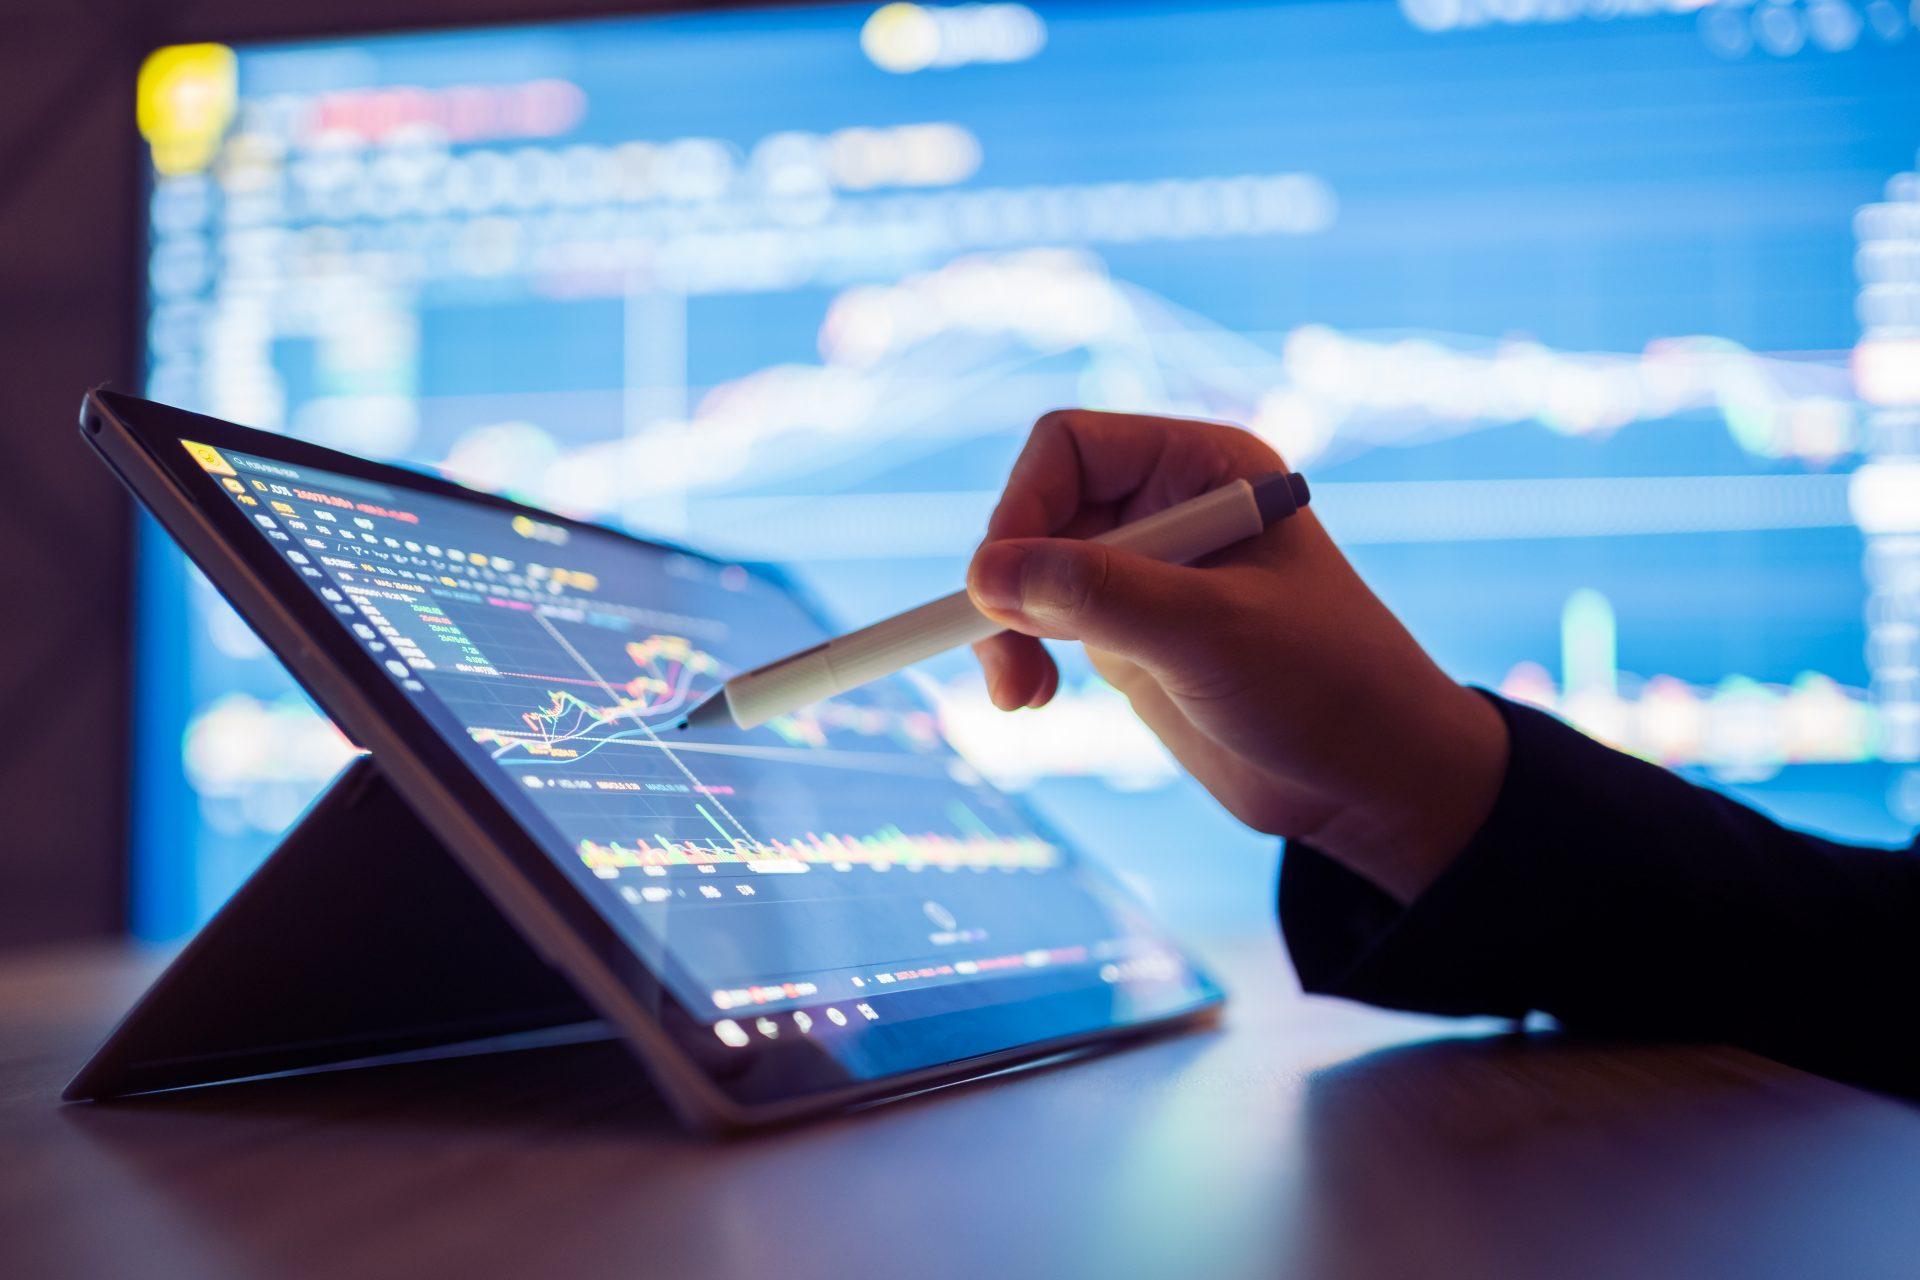 Read more about the article Onde investir? Conheça 4 opções de investimento!